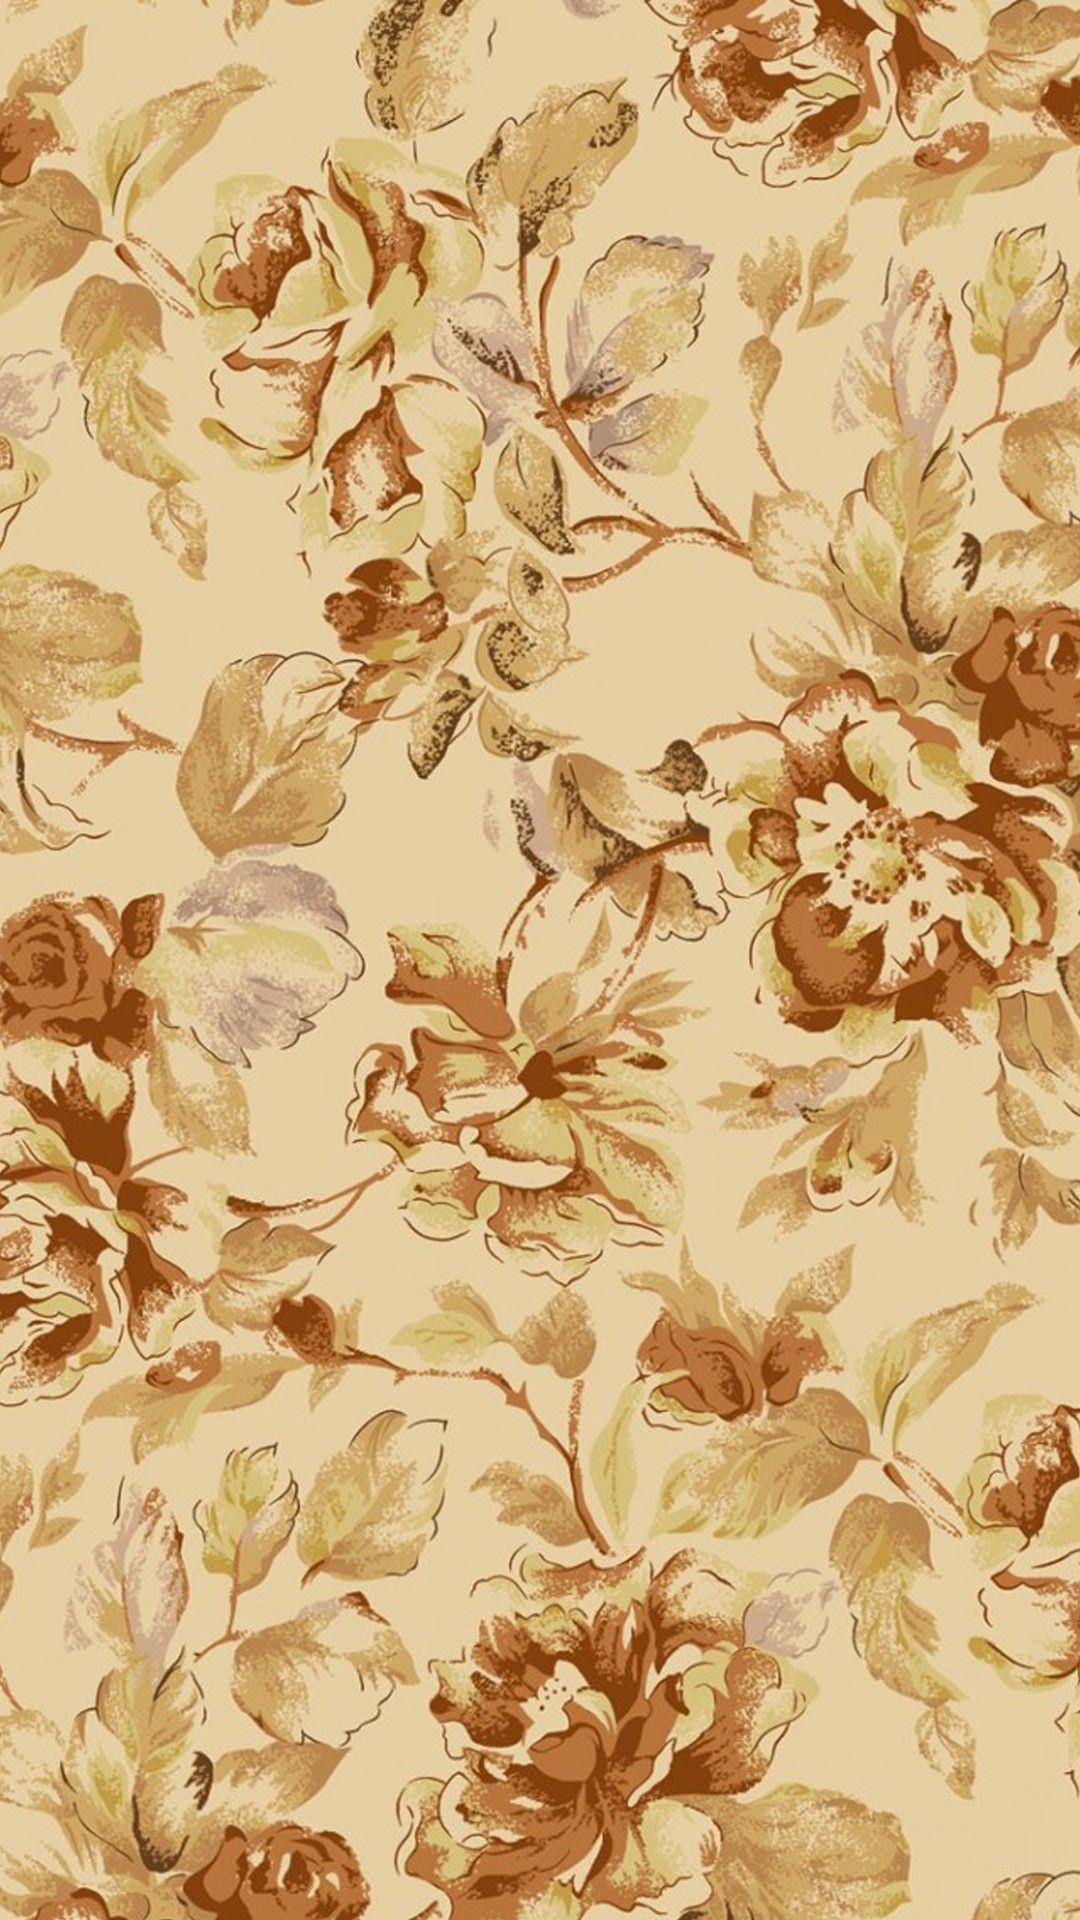 茶色の花柄模様 Iphone6 Plus壁紙 Wallpaperbox 茶色 壁紙 白黒 壁紙 Iphone 用壁紙